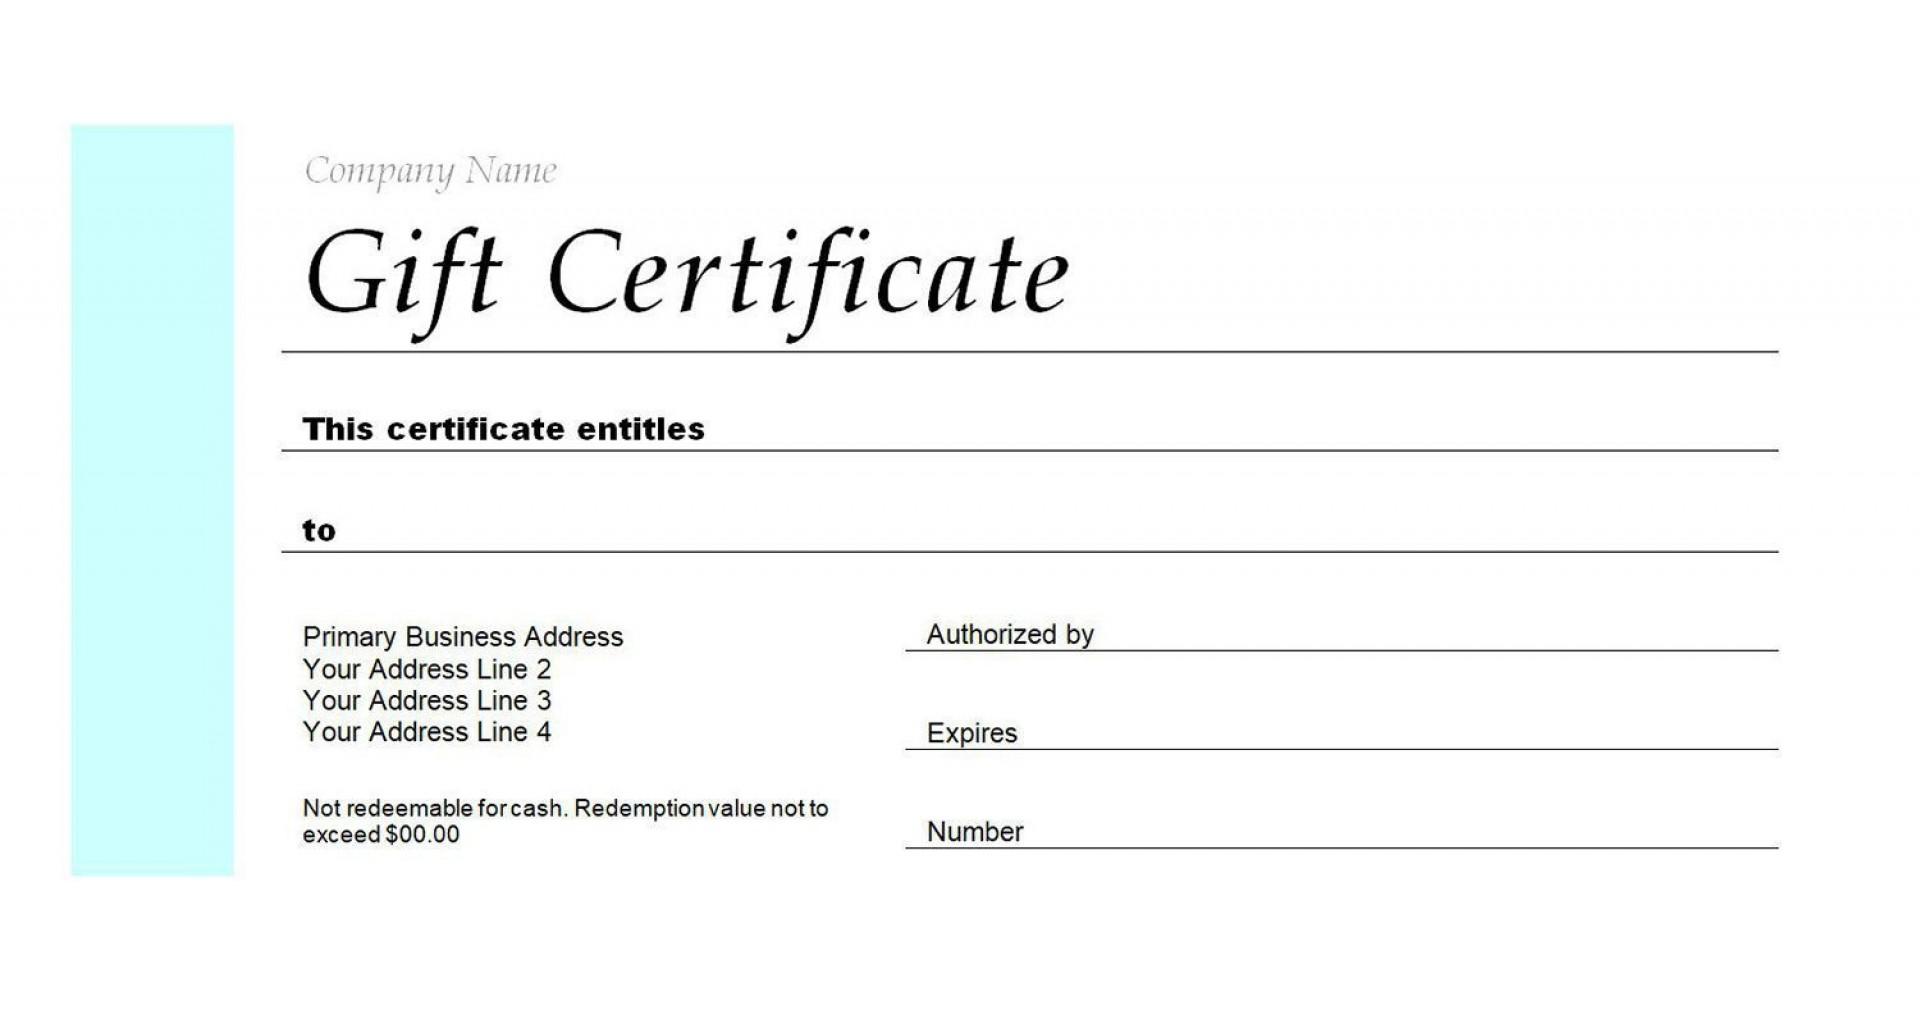 007 Singular Restaurant Gift Certificate Template High Definition  Templates Card Word Voucher Free1920